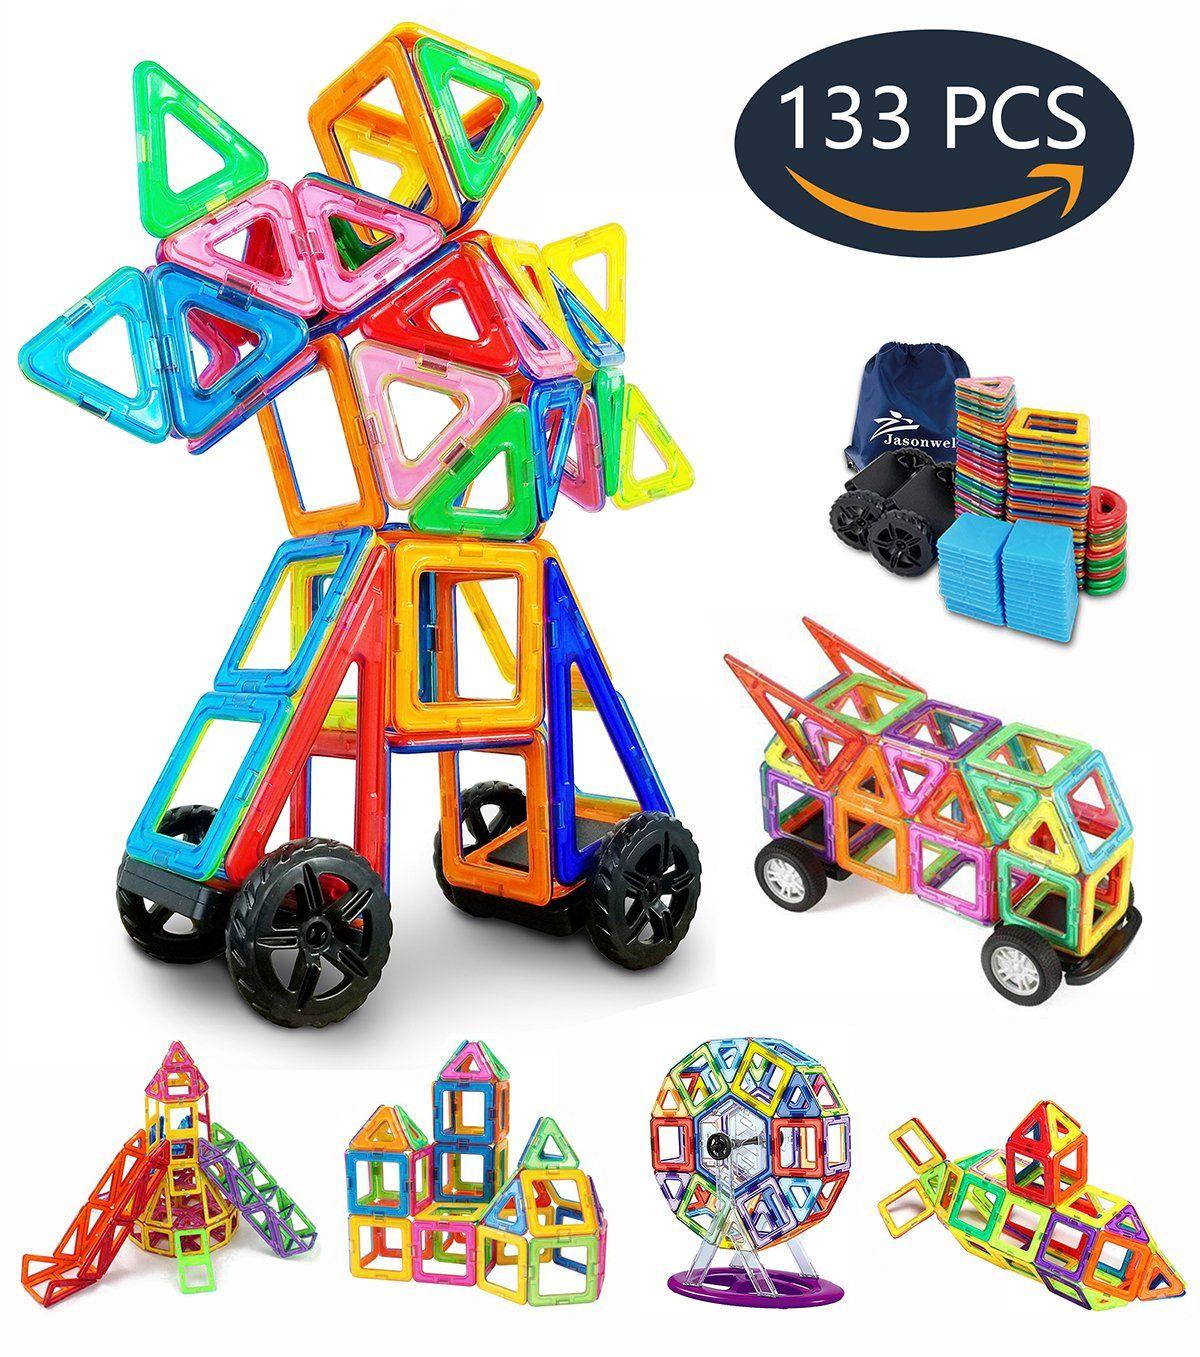 Jasonwell 133 Pieces Creative Magnetic Building Blocks For Boys S Tiles Set Preschool Educational Construction Kit Magnet Stacking